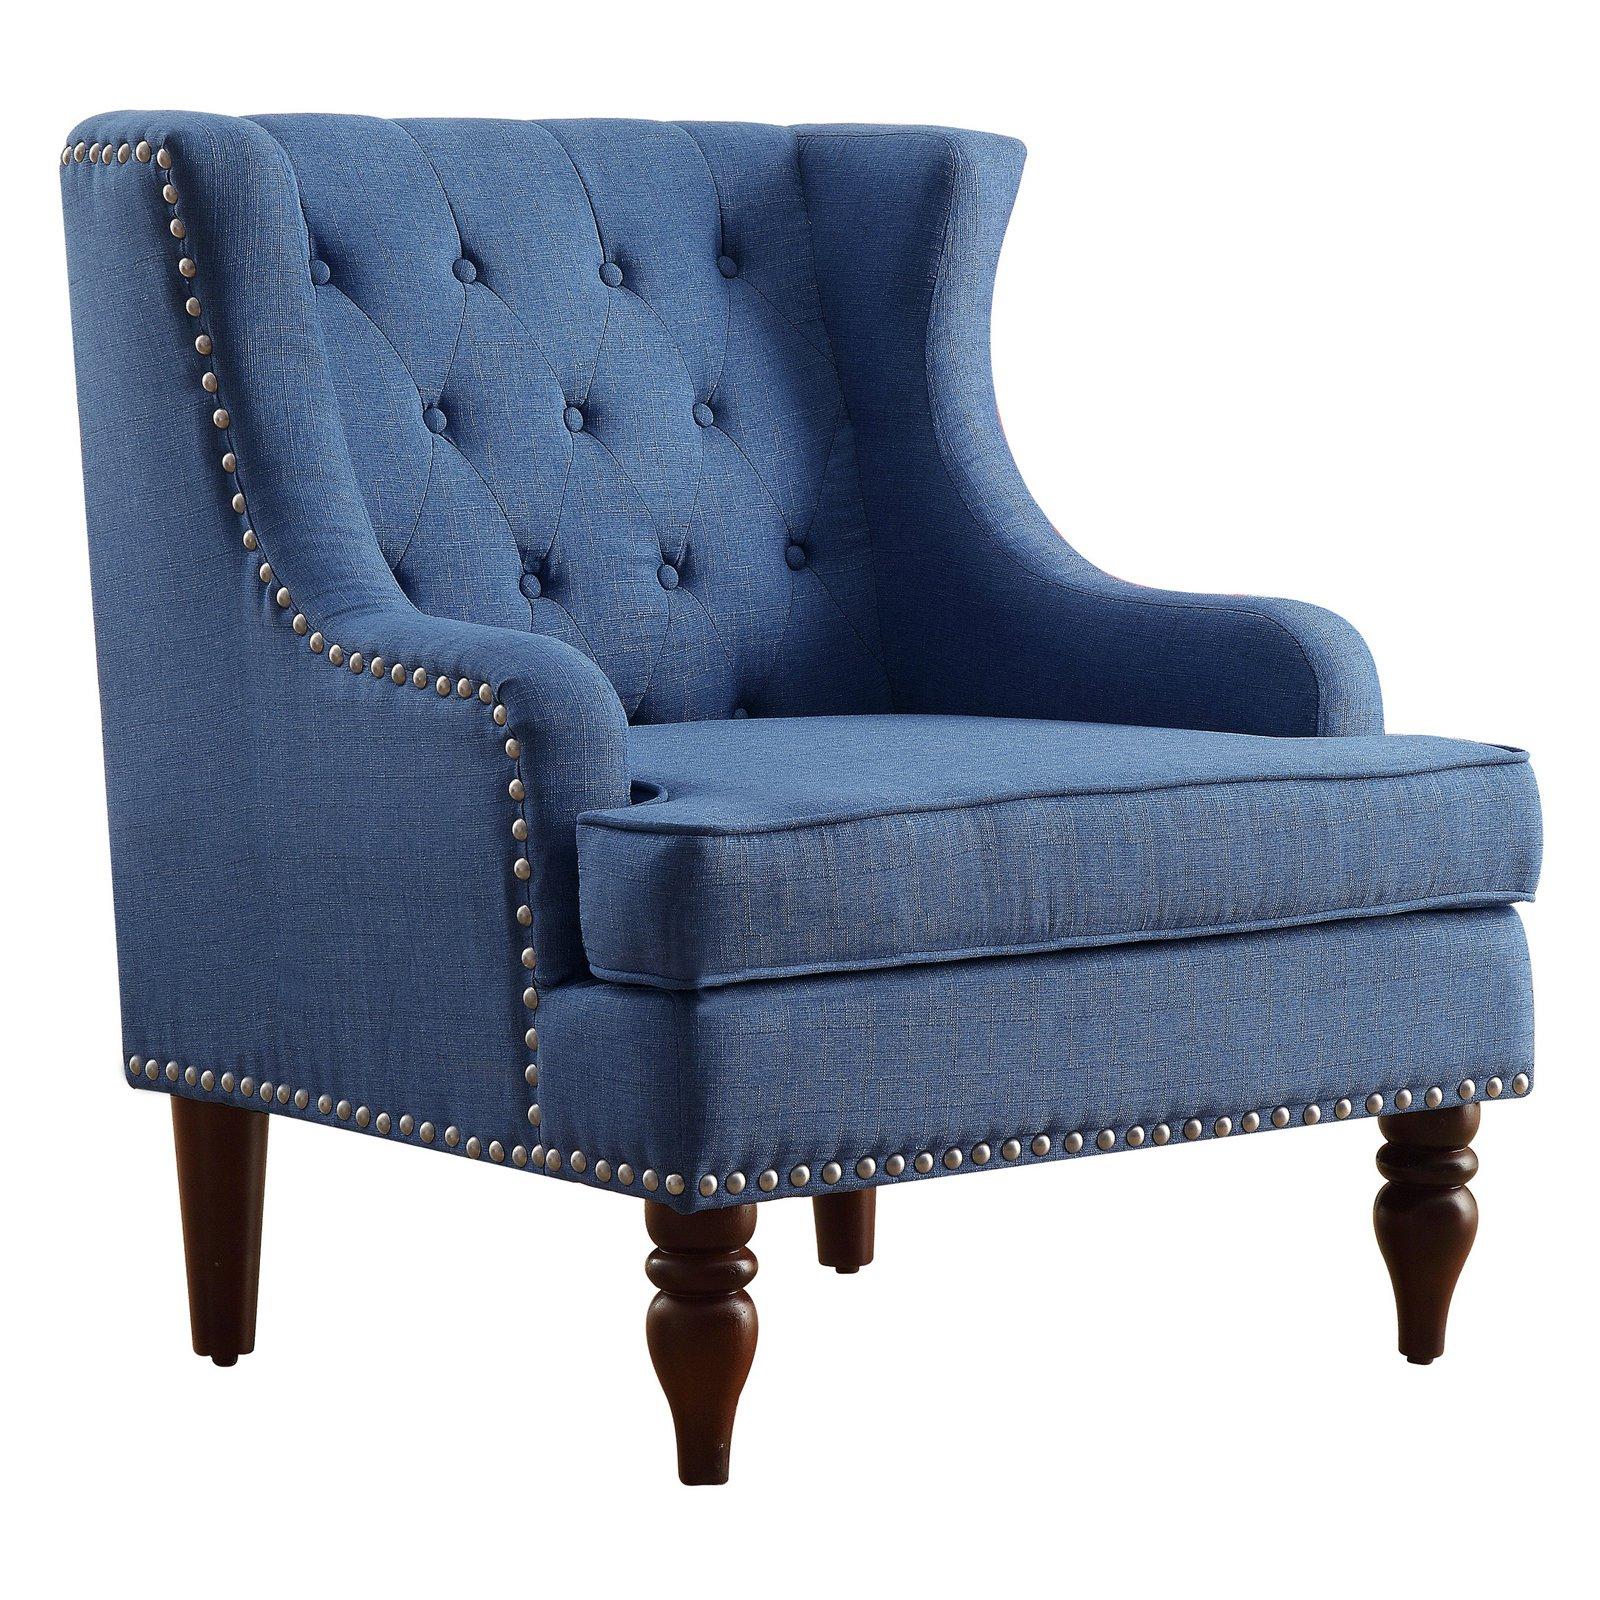 Rosevera Carafa Tufted Wingback Armchair